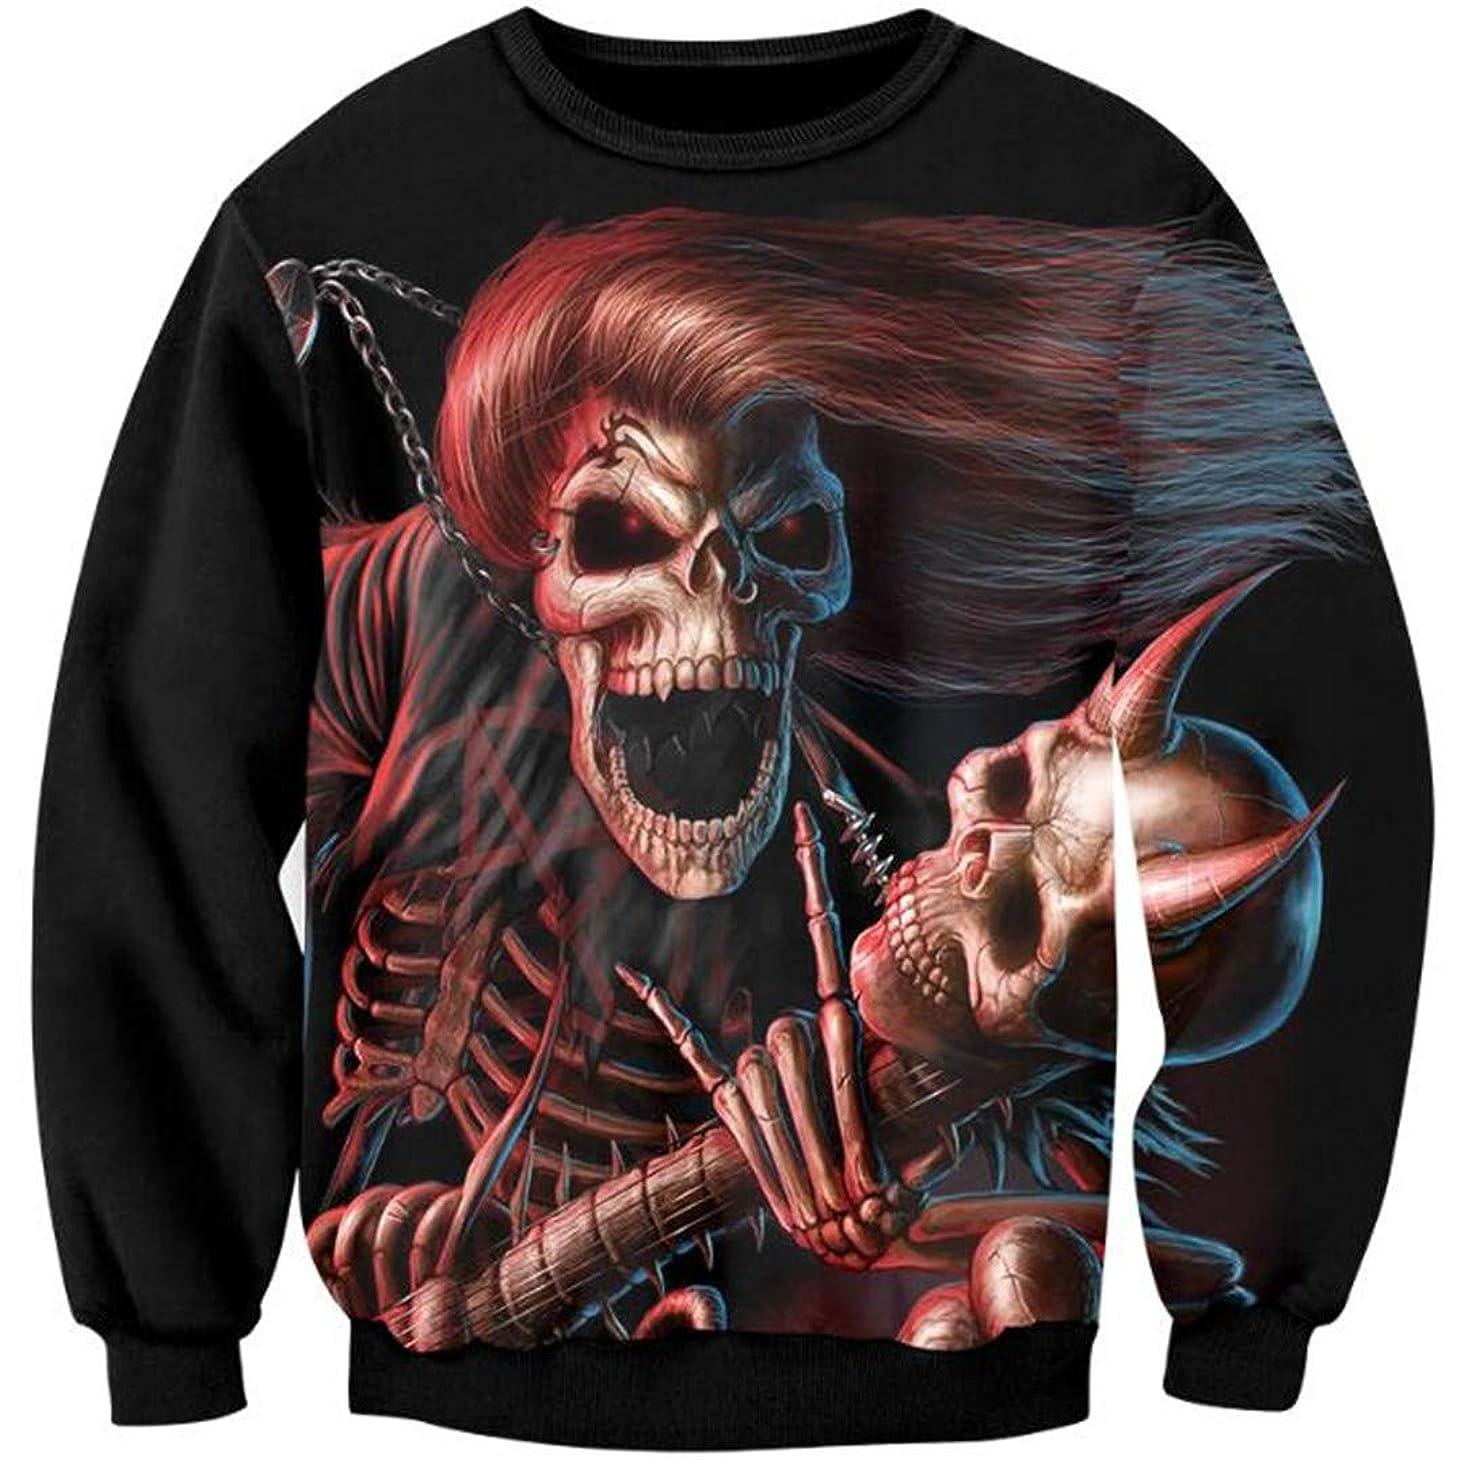 YL-HENOOSNG Men 3D Full Printing Skeleton Evil Sweatshirt Clothing Hip Hop Hoodies Plus Size Tracksuits